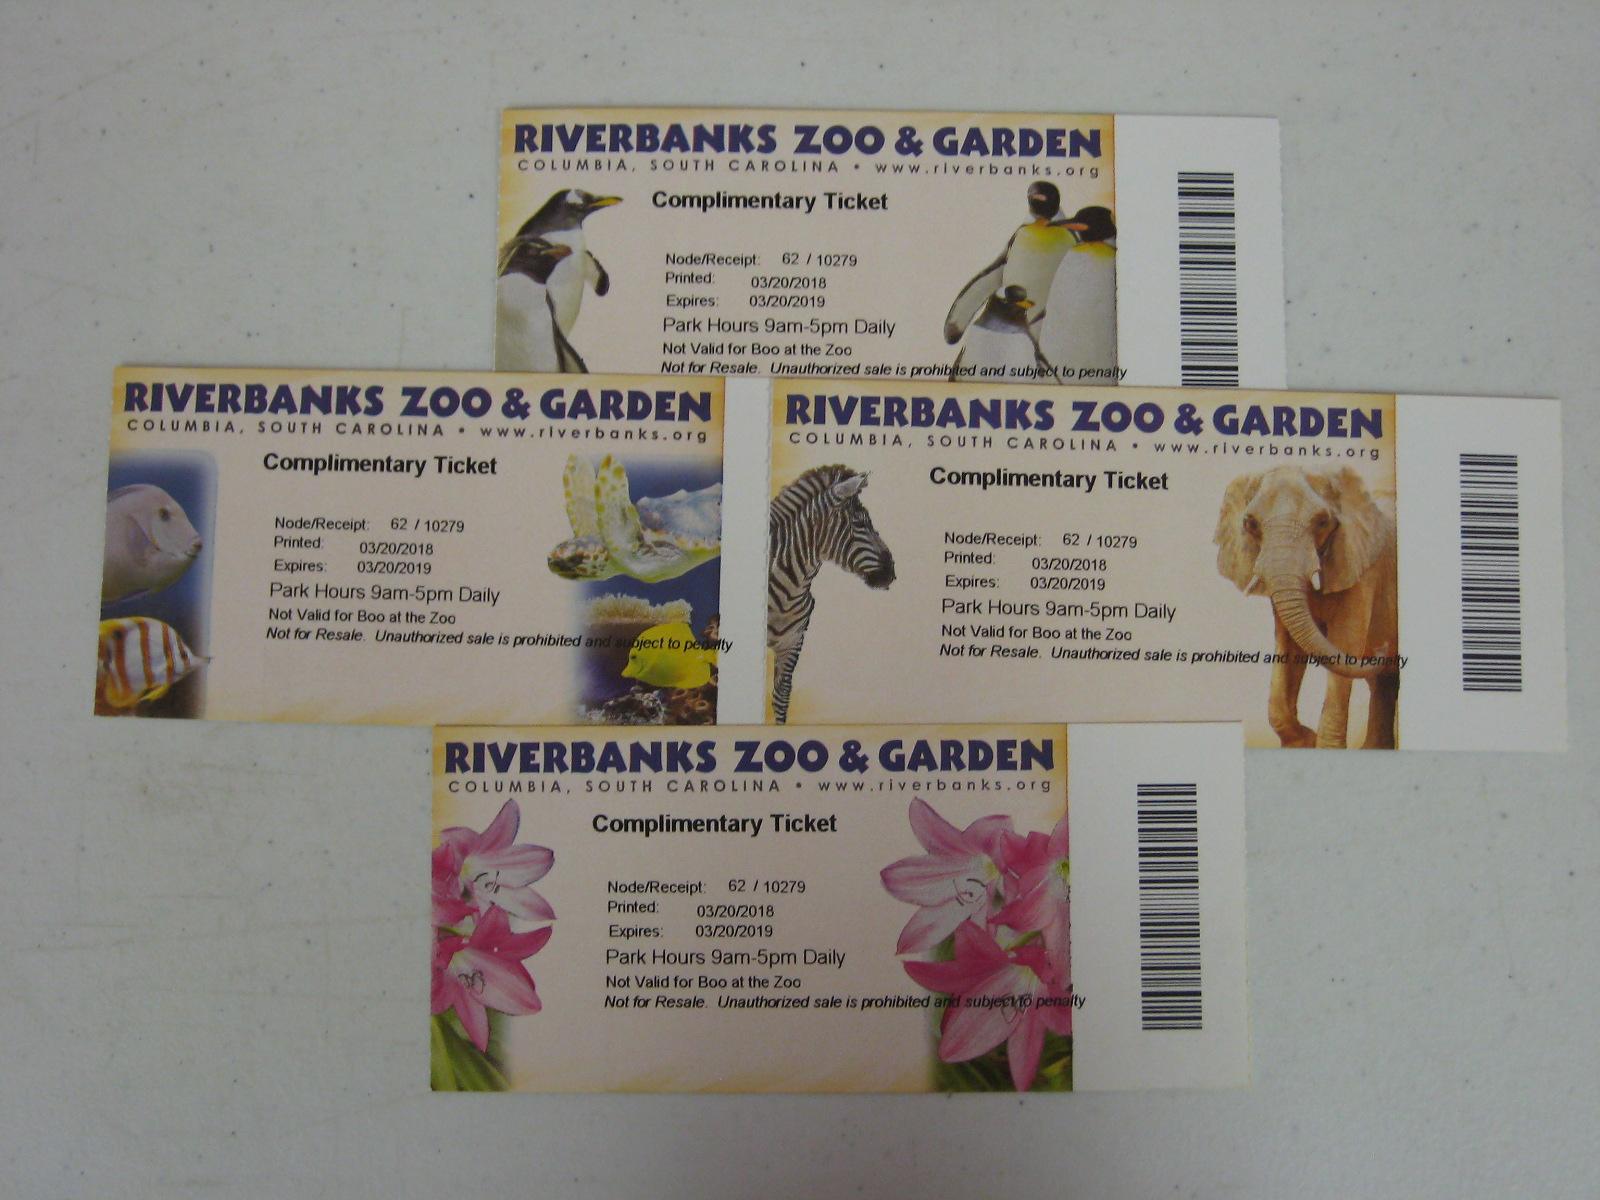 4 Tickets to Riveranks Zoo & Garden